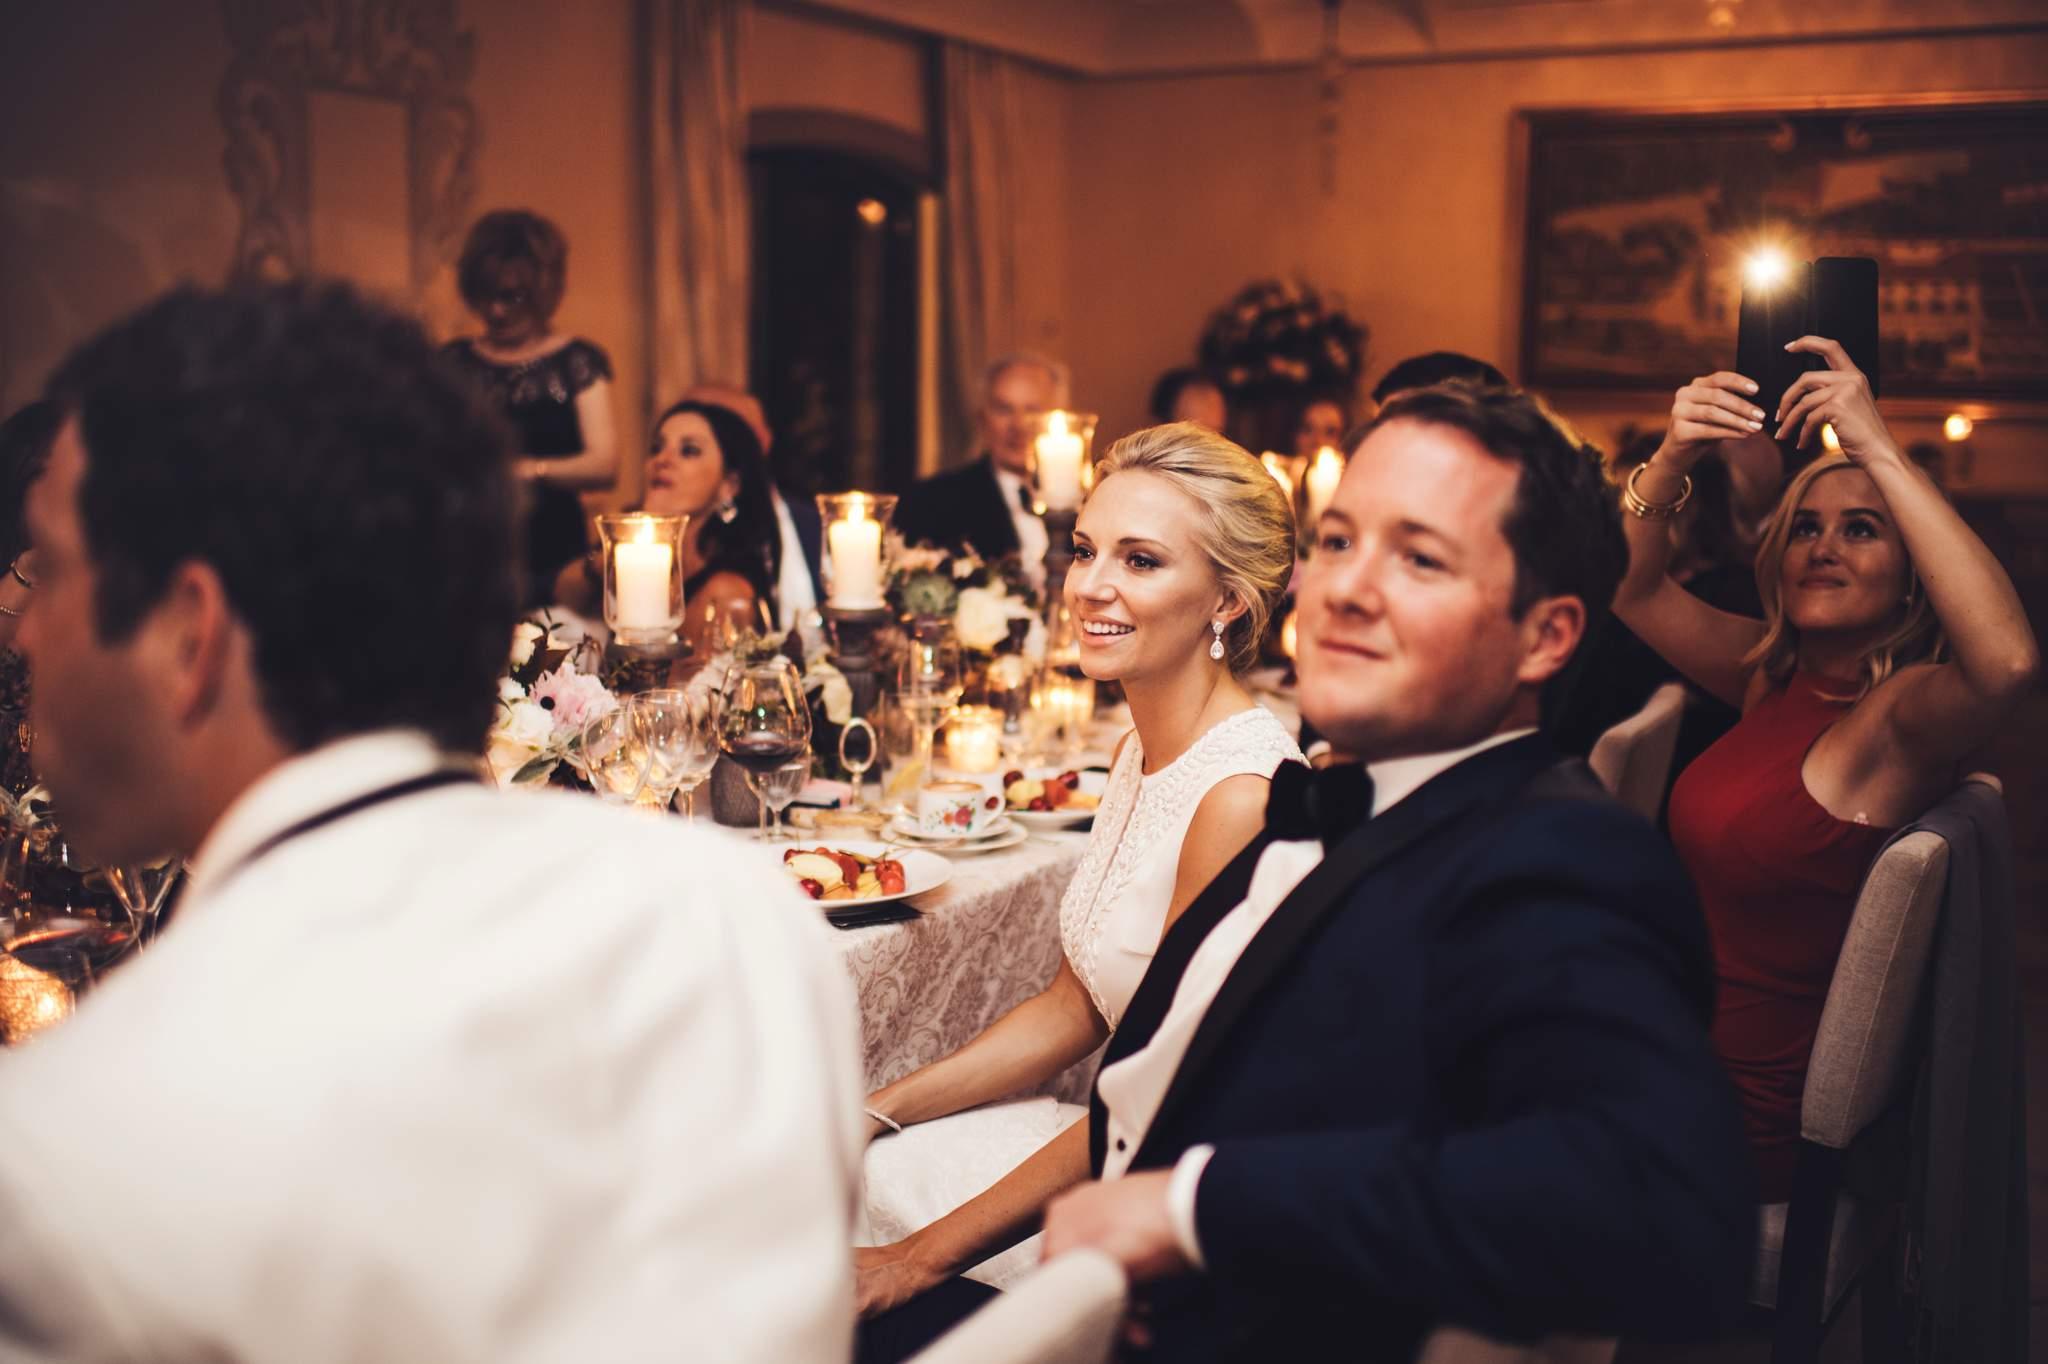 48wedding-photographer-belmond-san-michele-florence